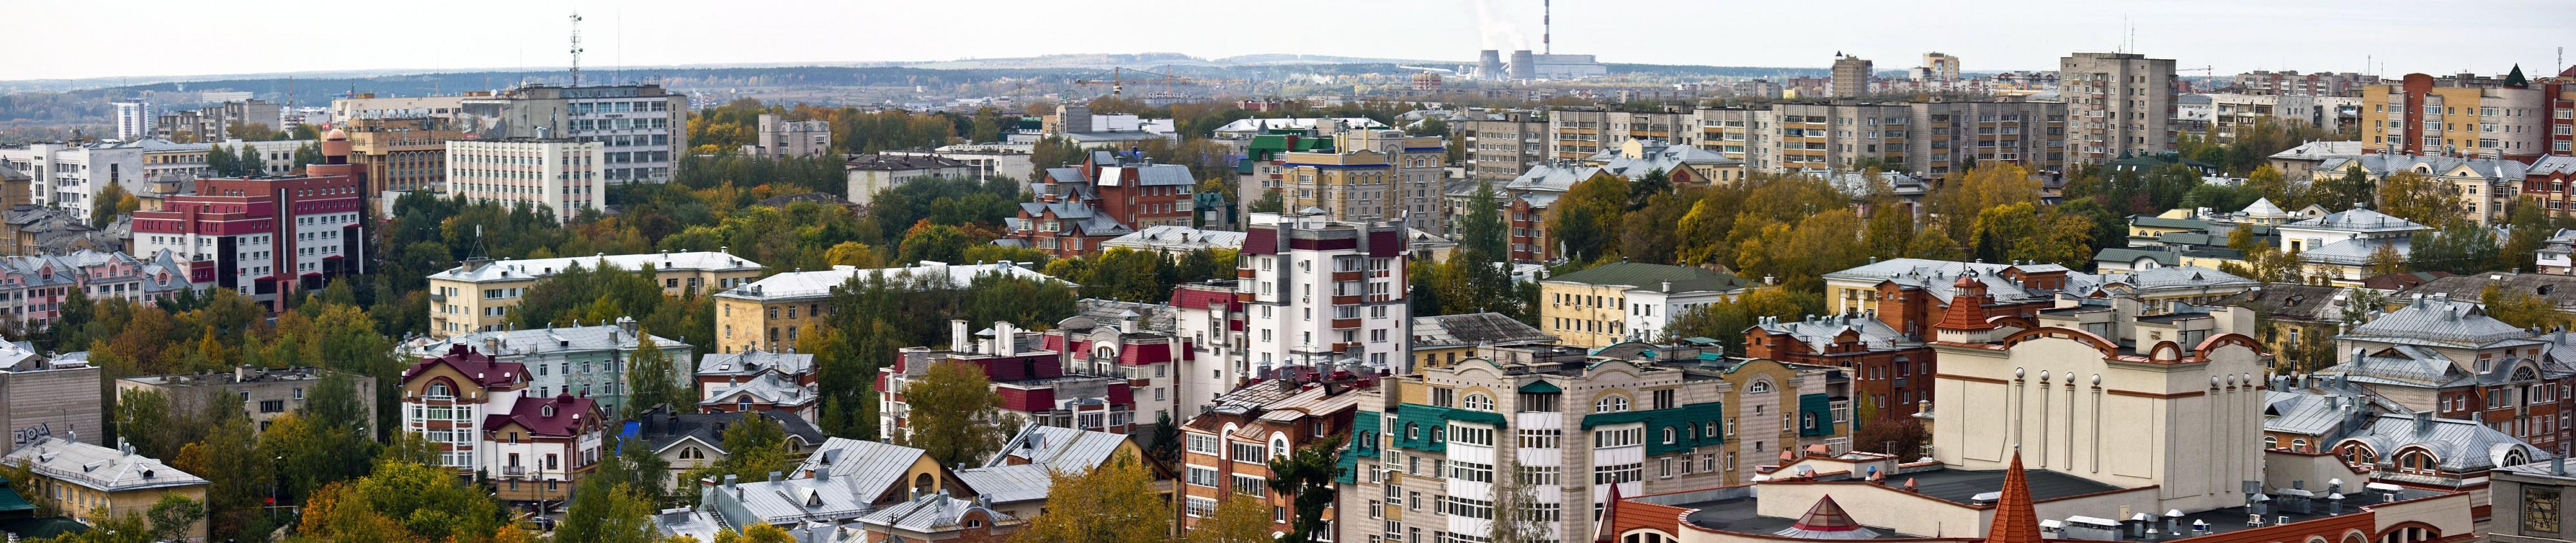 http://nesiditsa.ru/wp-content/uploads/2012/08/Kirov-4-4000x843.jpg